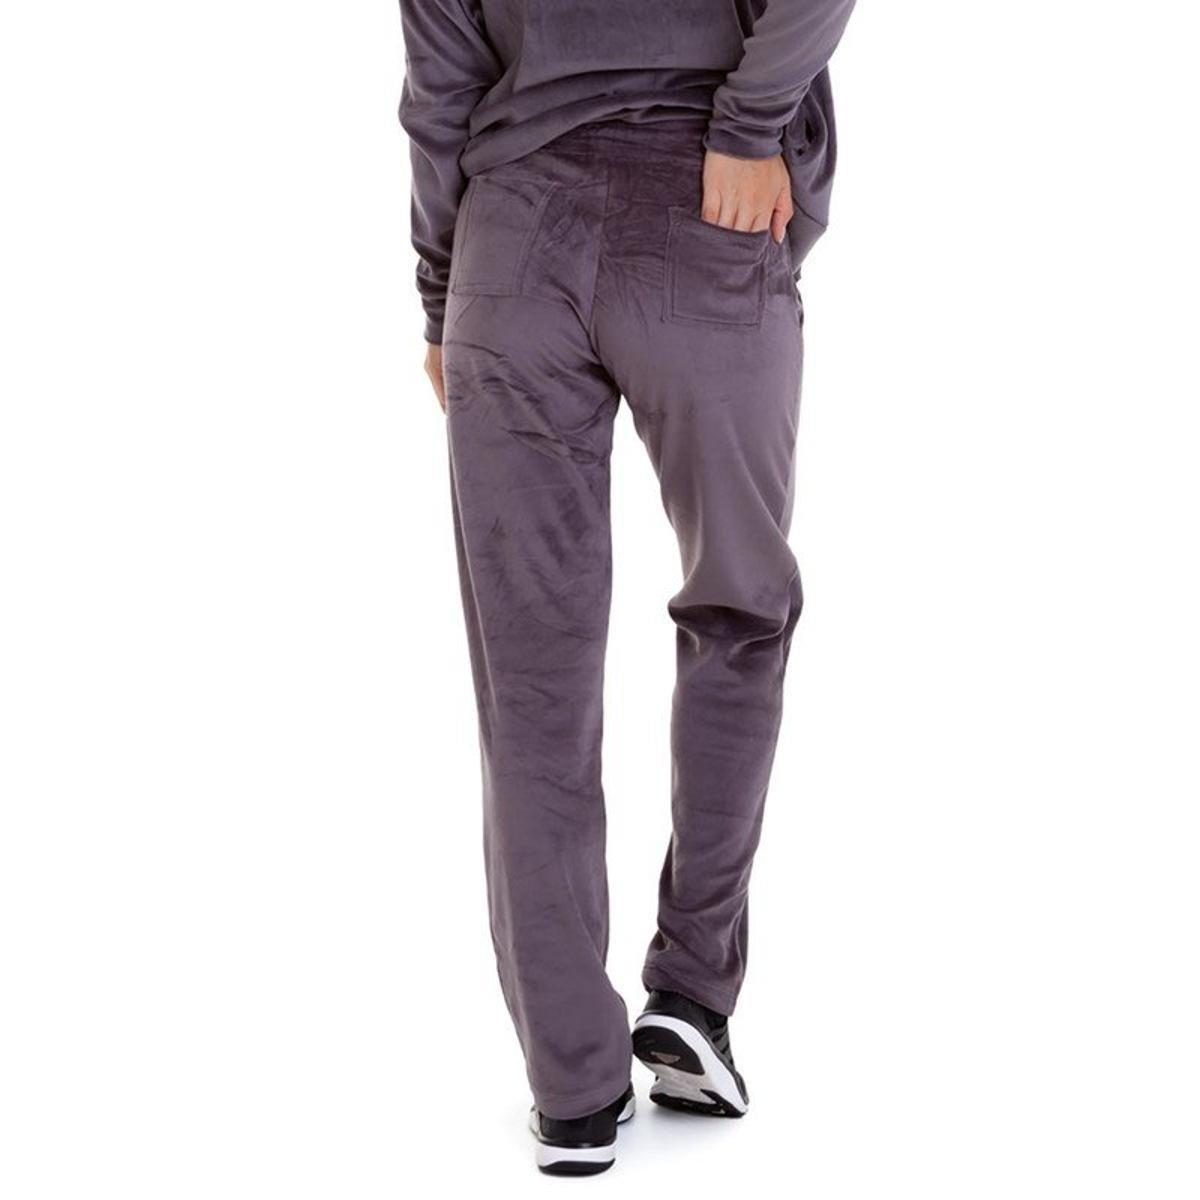 Calça de Plush Best Fit Feminina - Cinza - Compre Agora  83747e669b93c